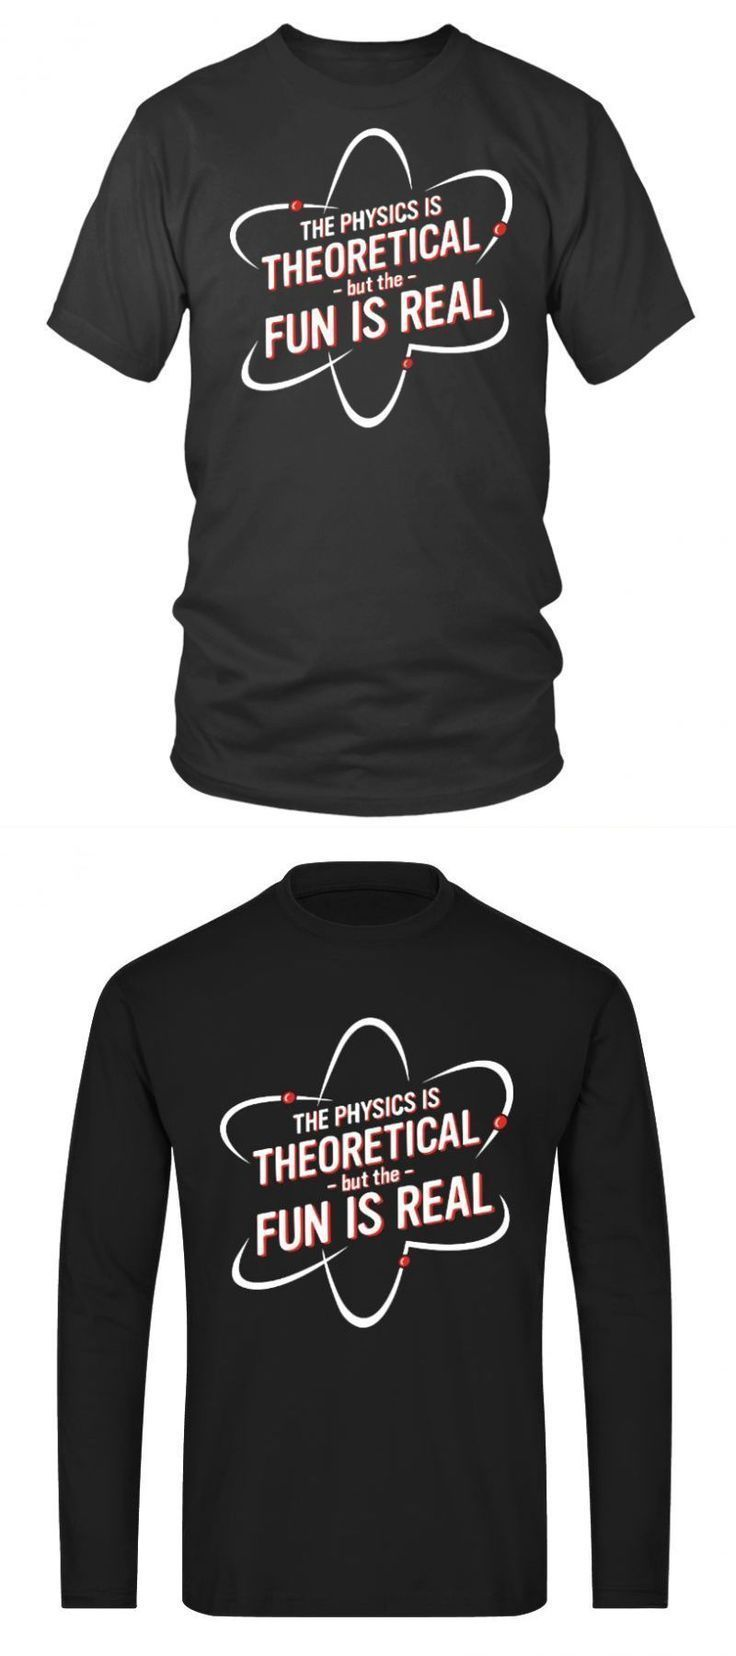 Angewandte Wissenschaft T-Shirt Physik ist theoretische Wissenschaft faire T-Shi…  # Wissenschaft